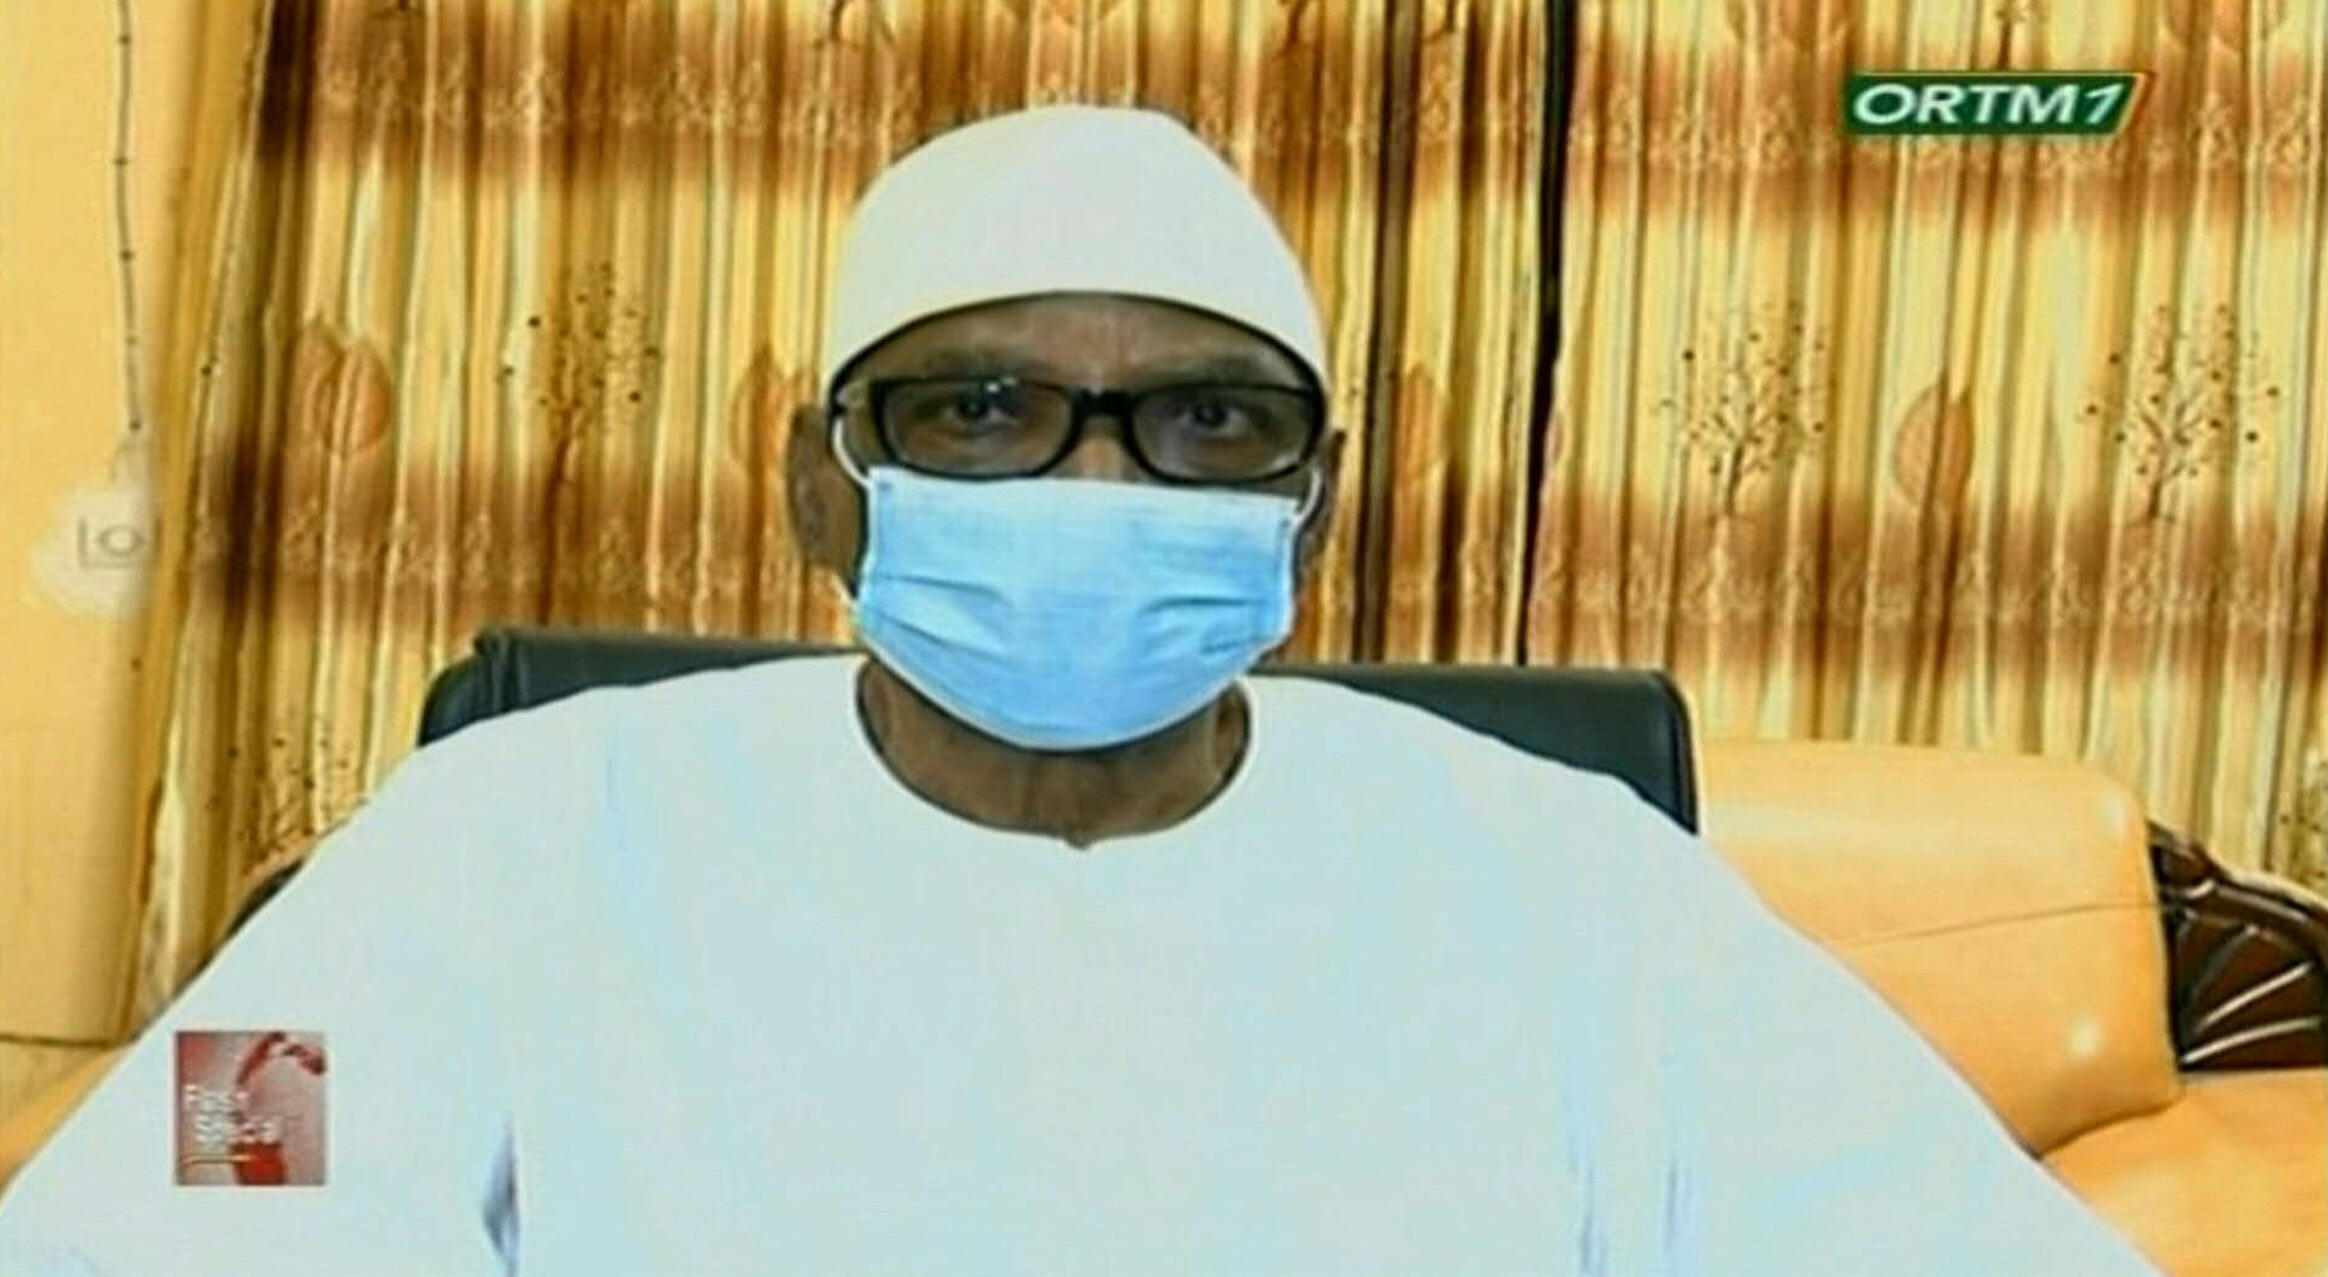 Malian President Ibrahim Boubacar Keïta announces his resignation on national television on August 19, 2020.